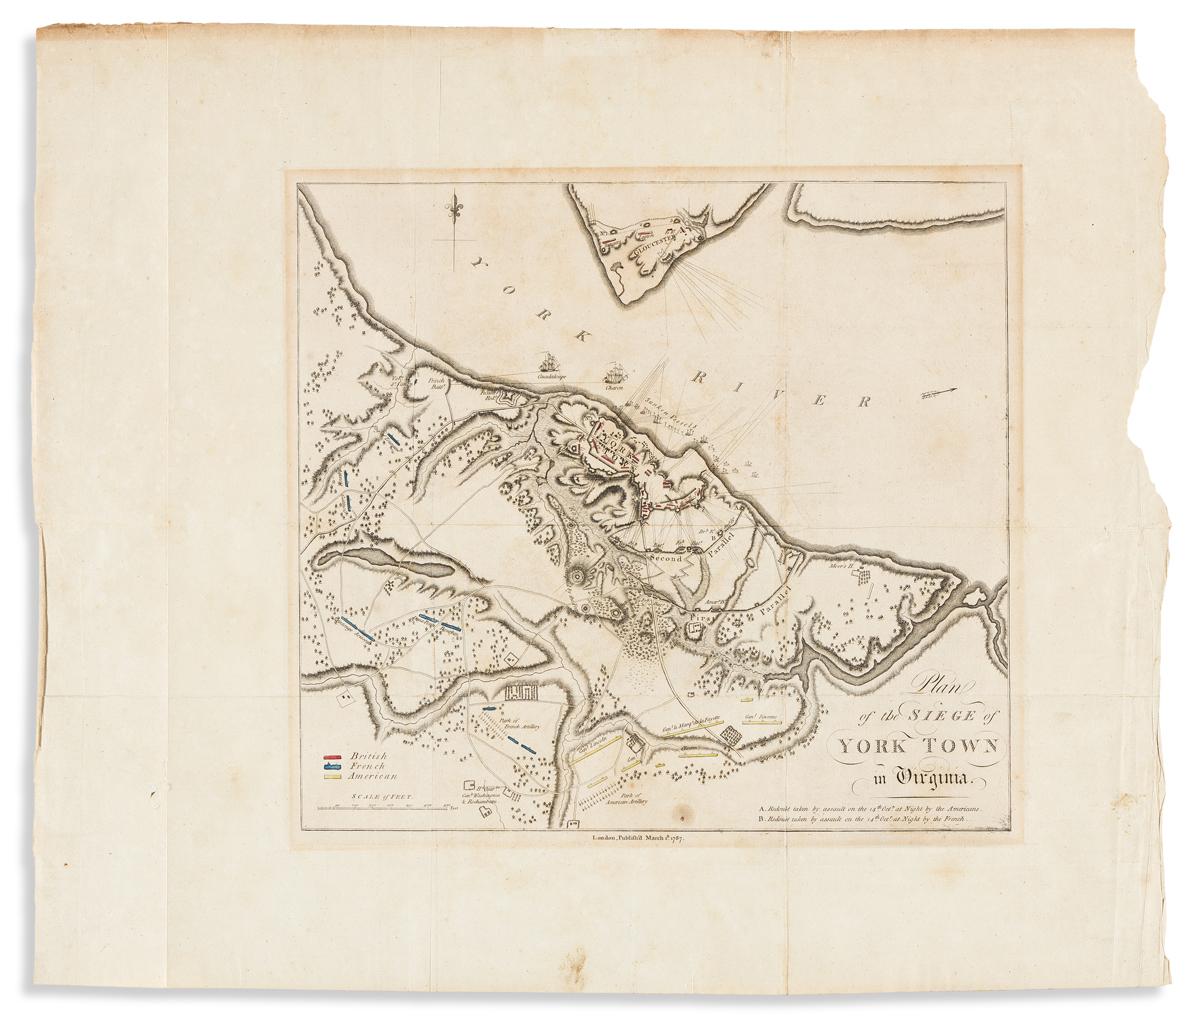 (REVOLUTION.) Plan of the Siege of Yorktown in Virginia.